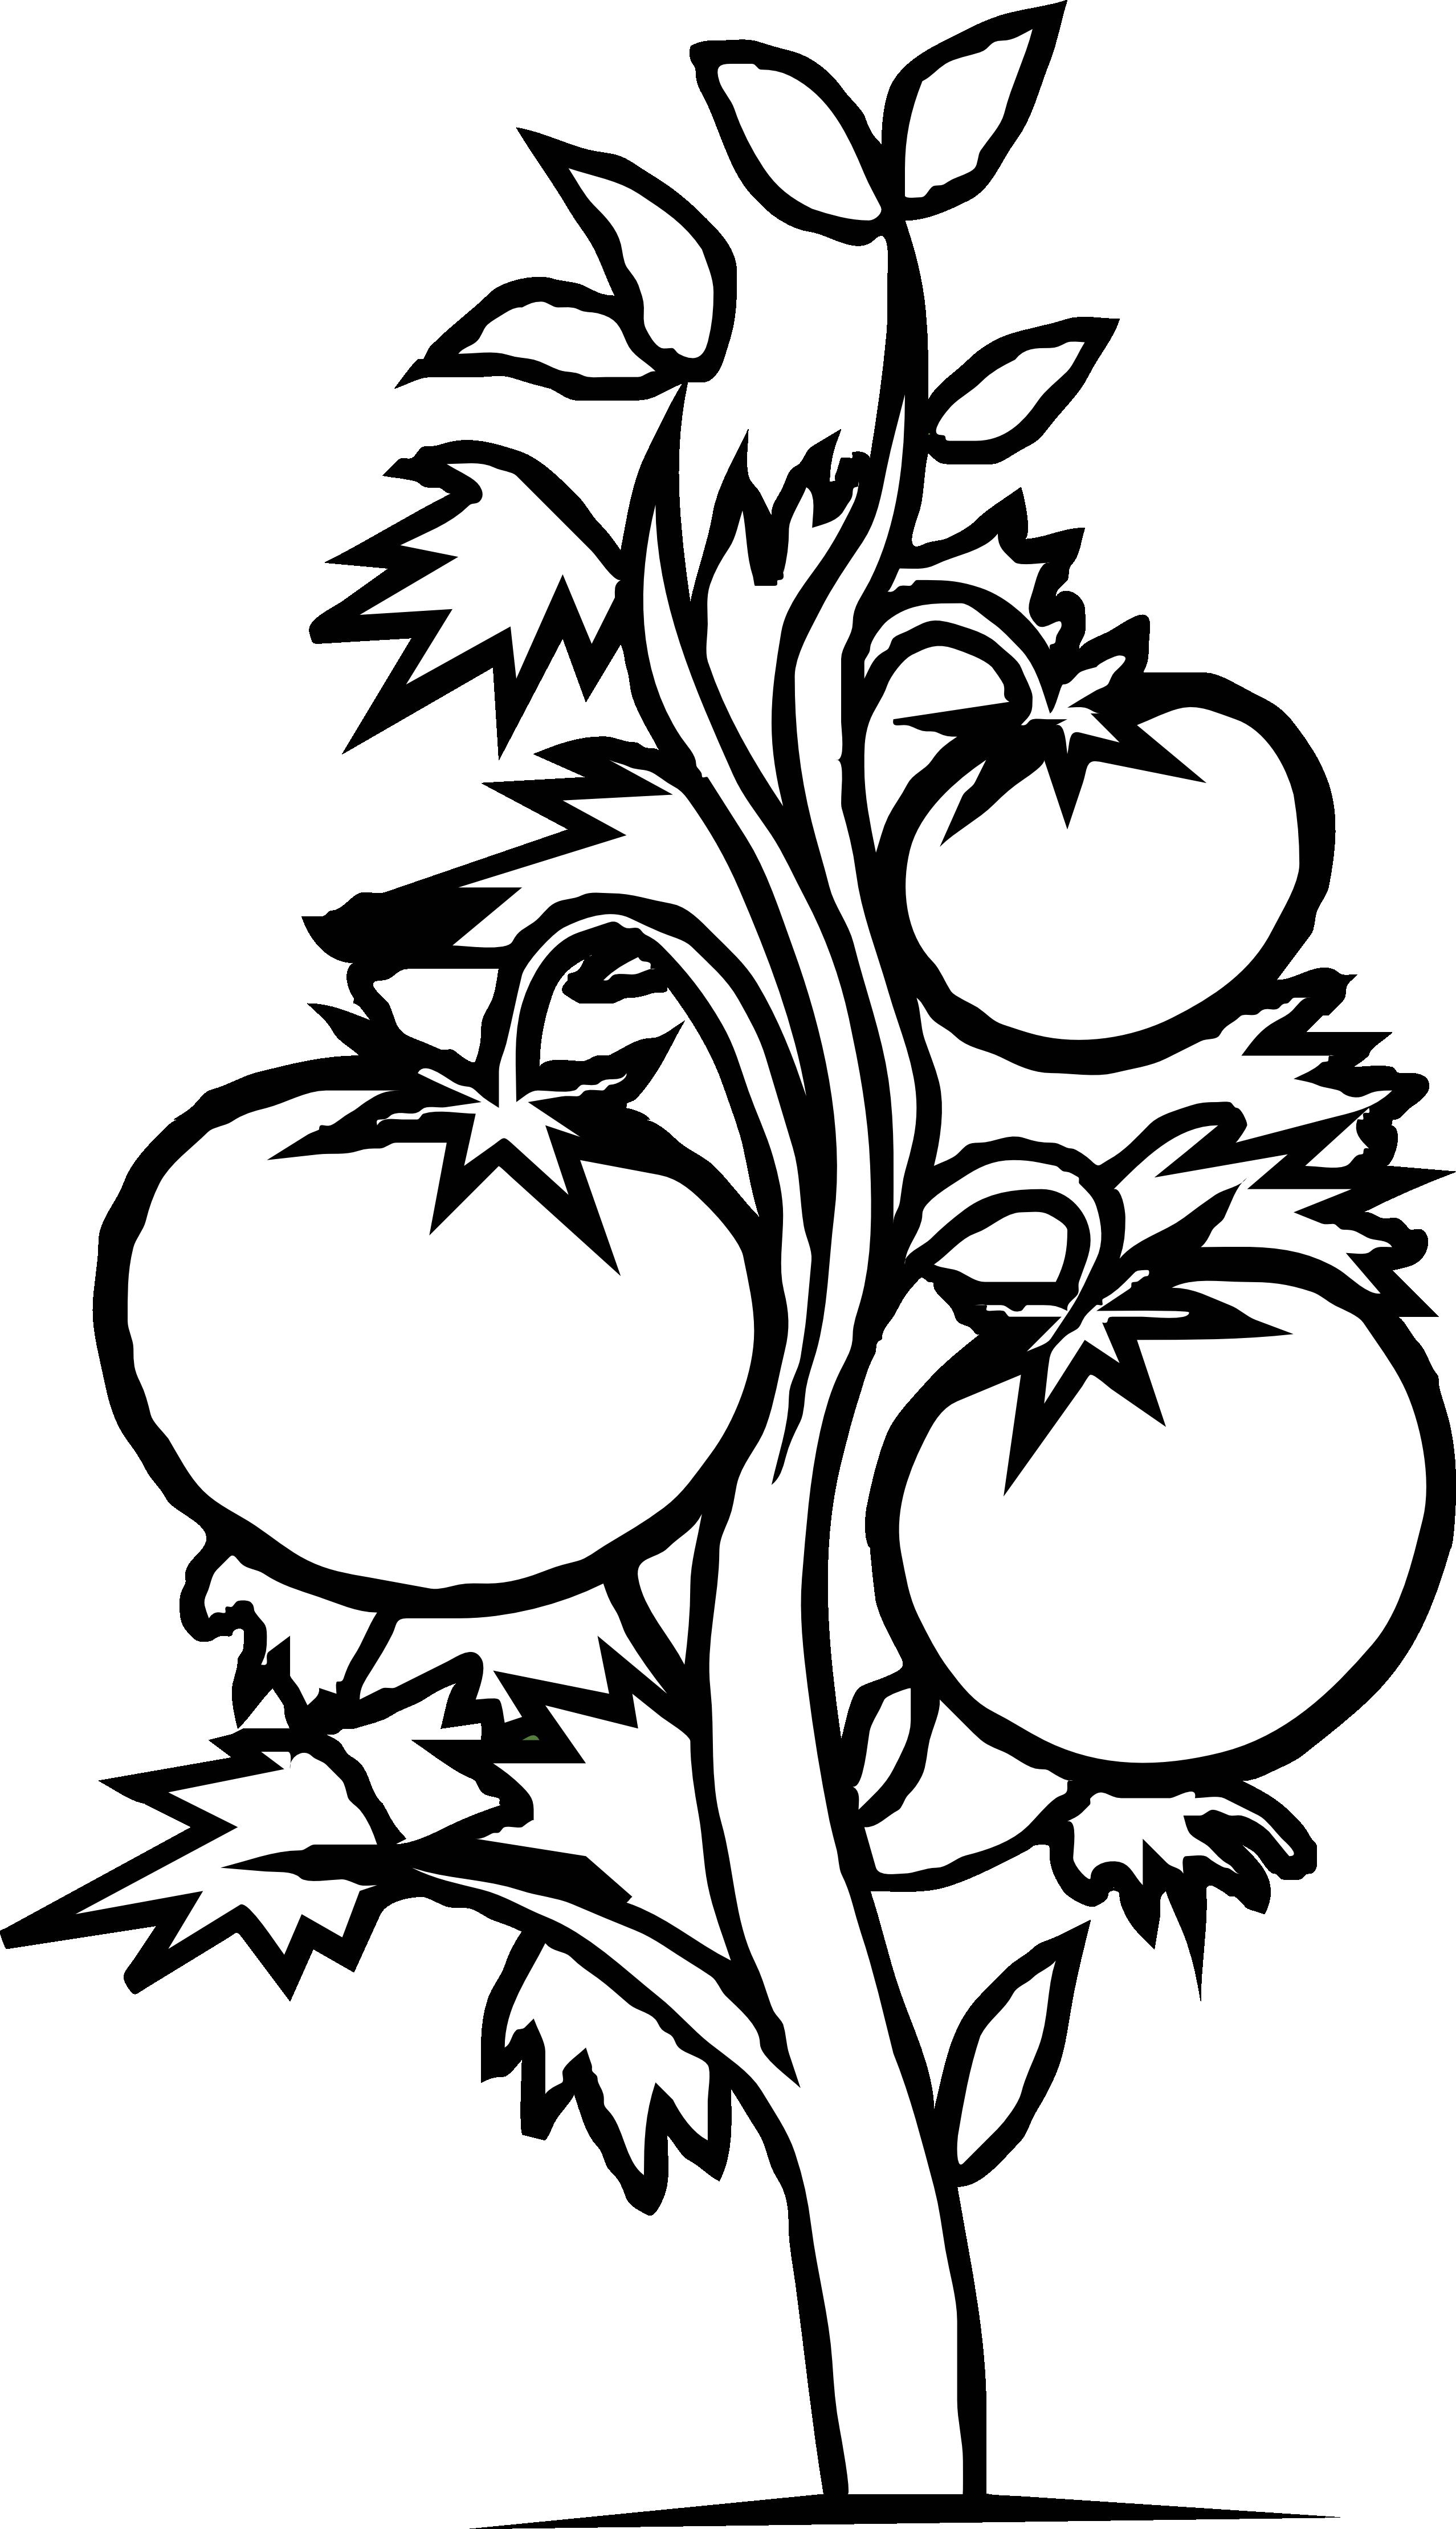 Tomato shrub clipground gabi. Zombie clipart black and white